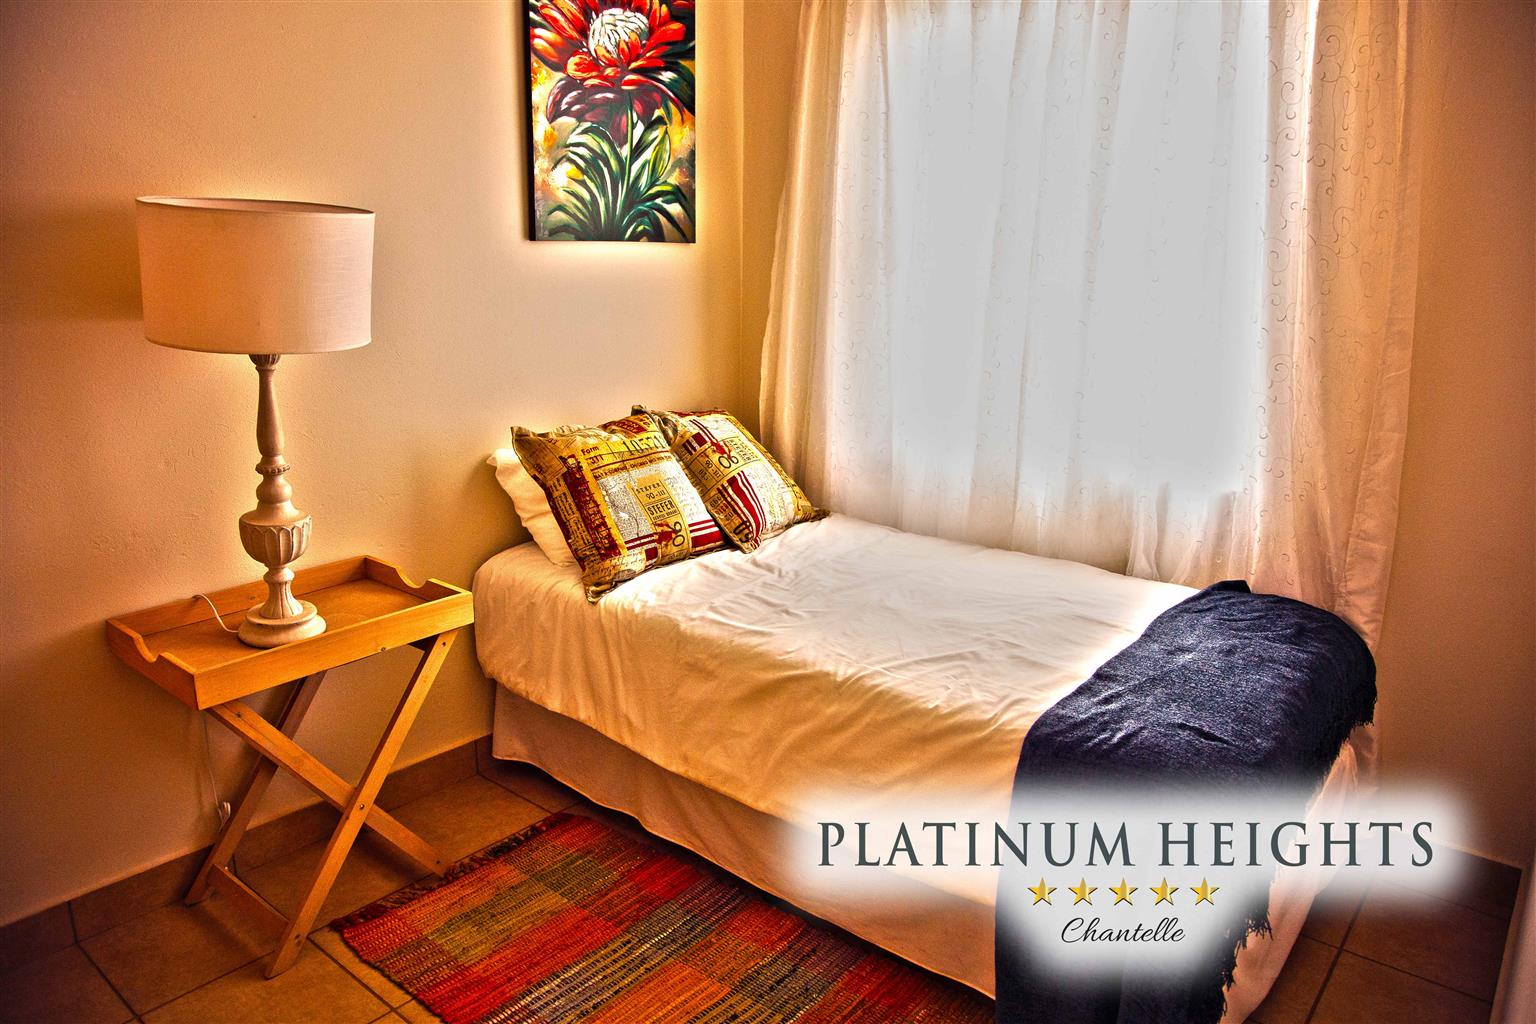 2 BEDROOM 1 BATHROOM UNITS FOR RENTAL IN CHANTELLE AKASIA